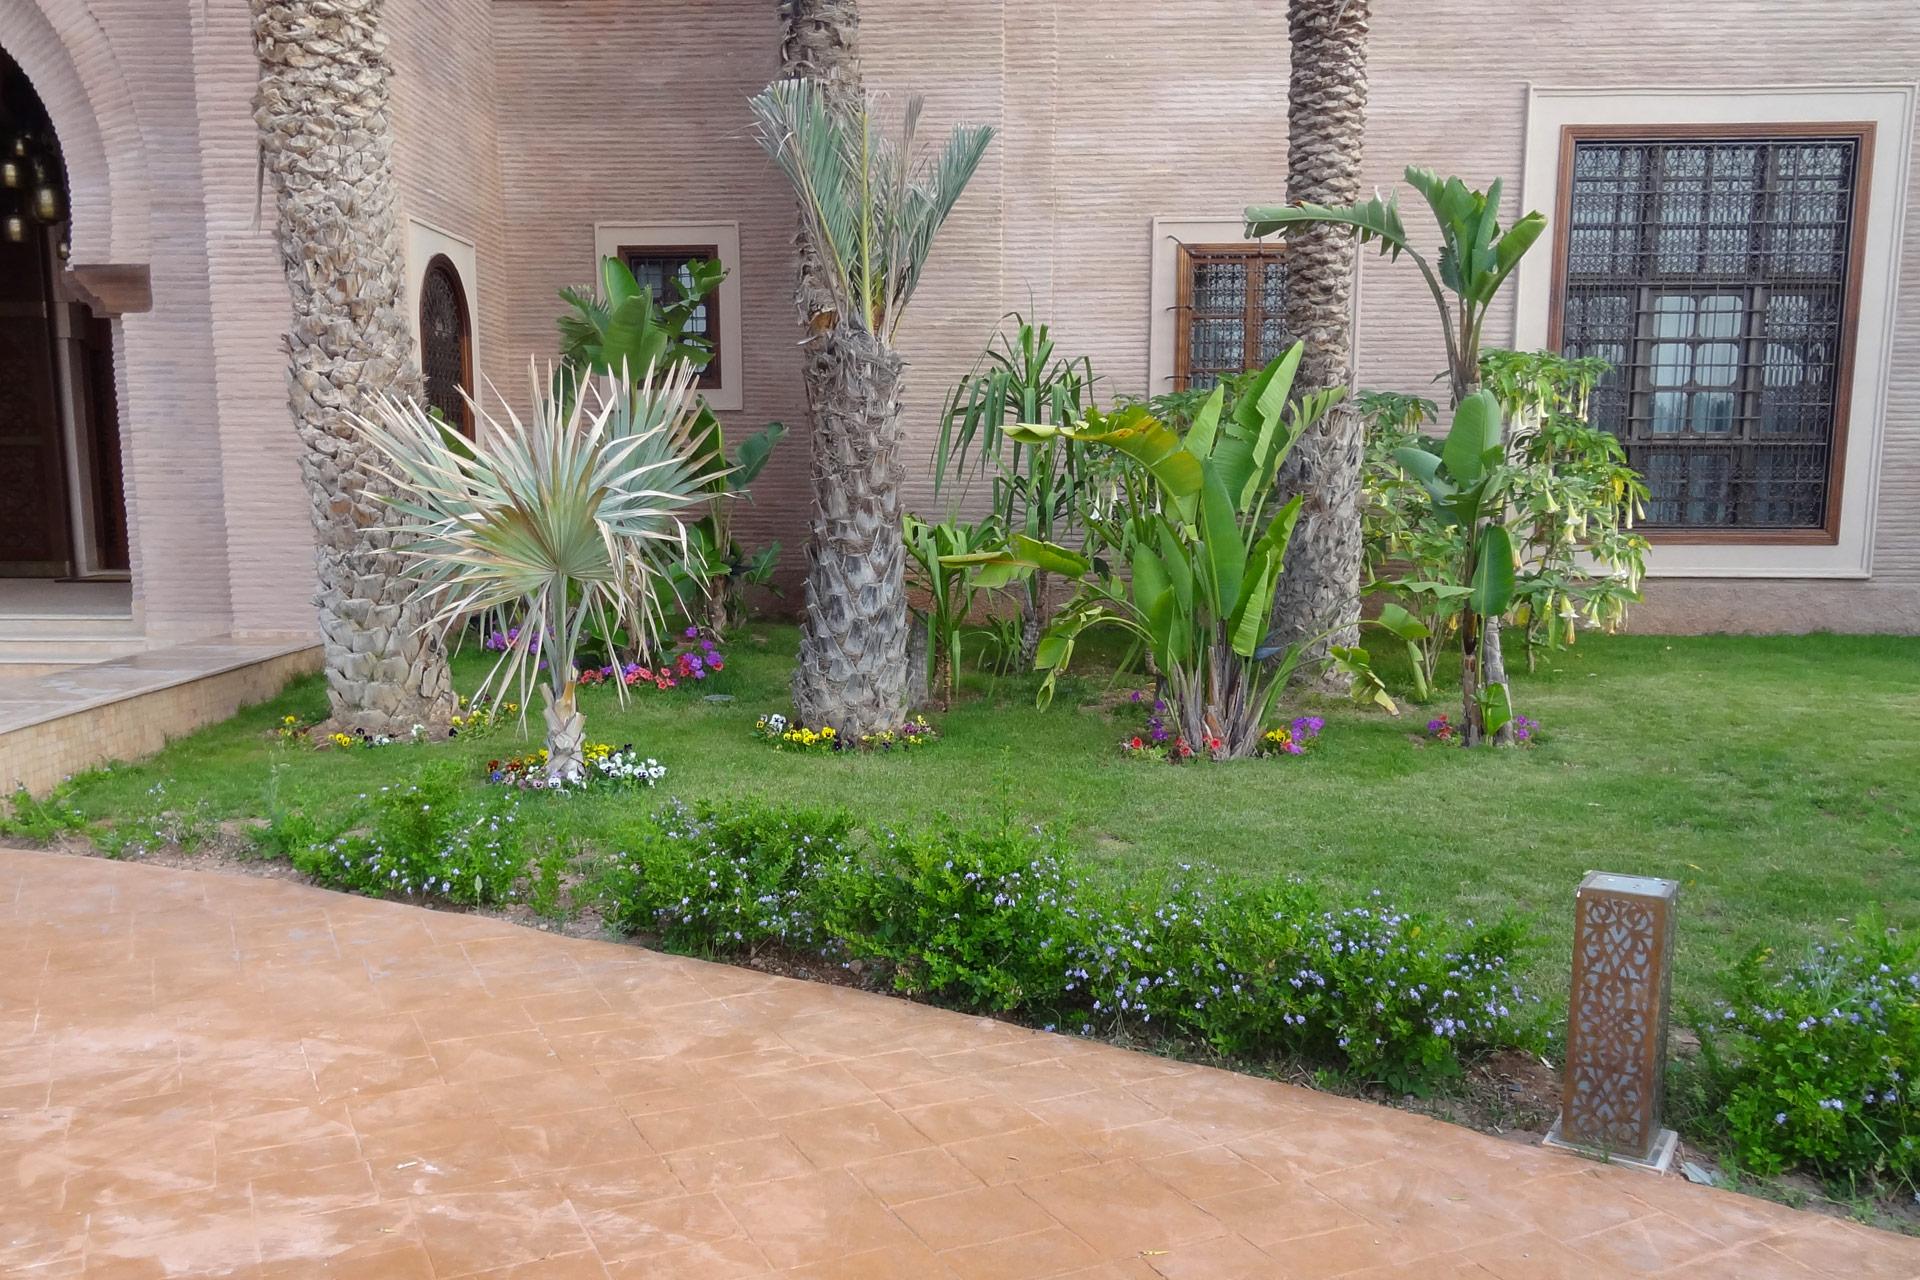 Jardín estilo árabe